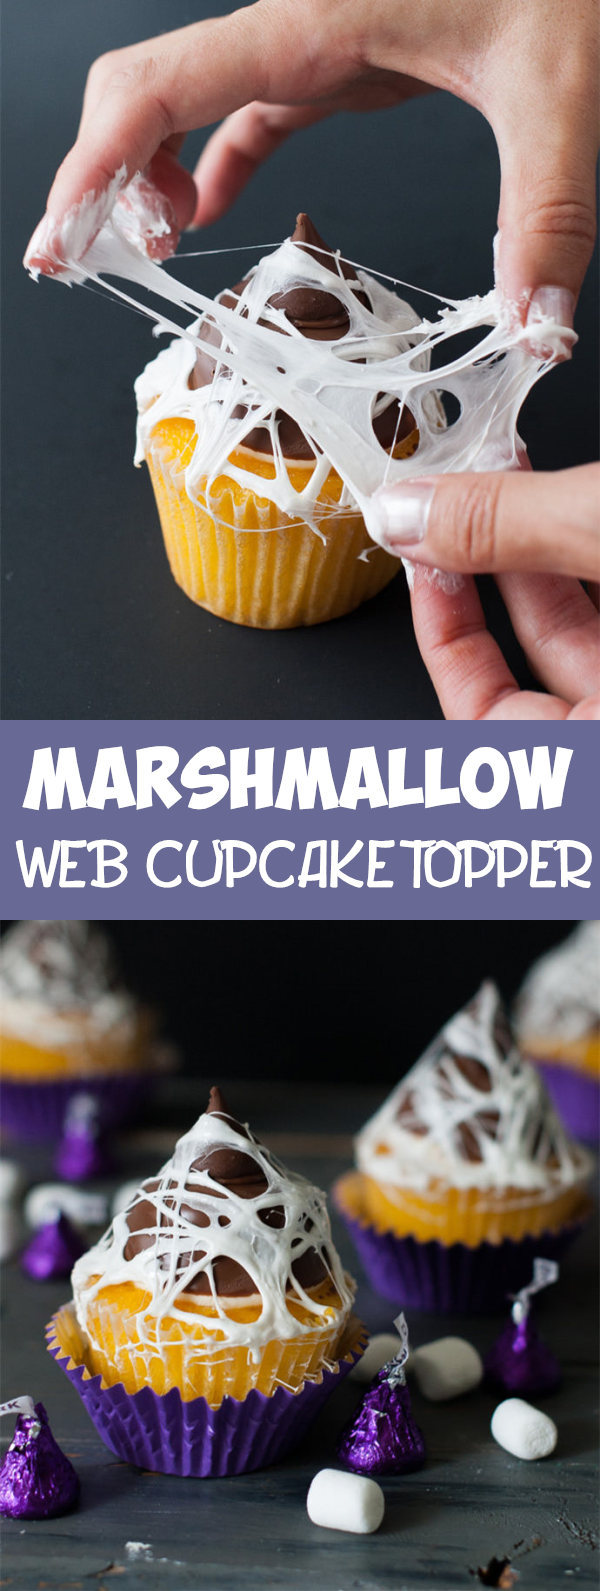 Marshmallow Web Cupcake Topper